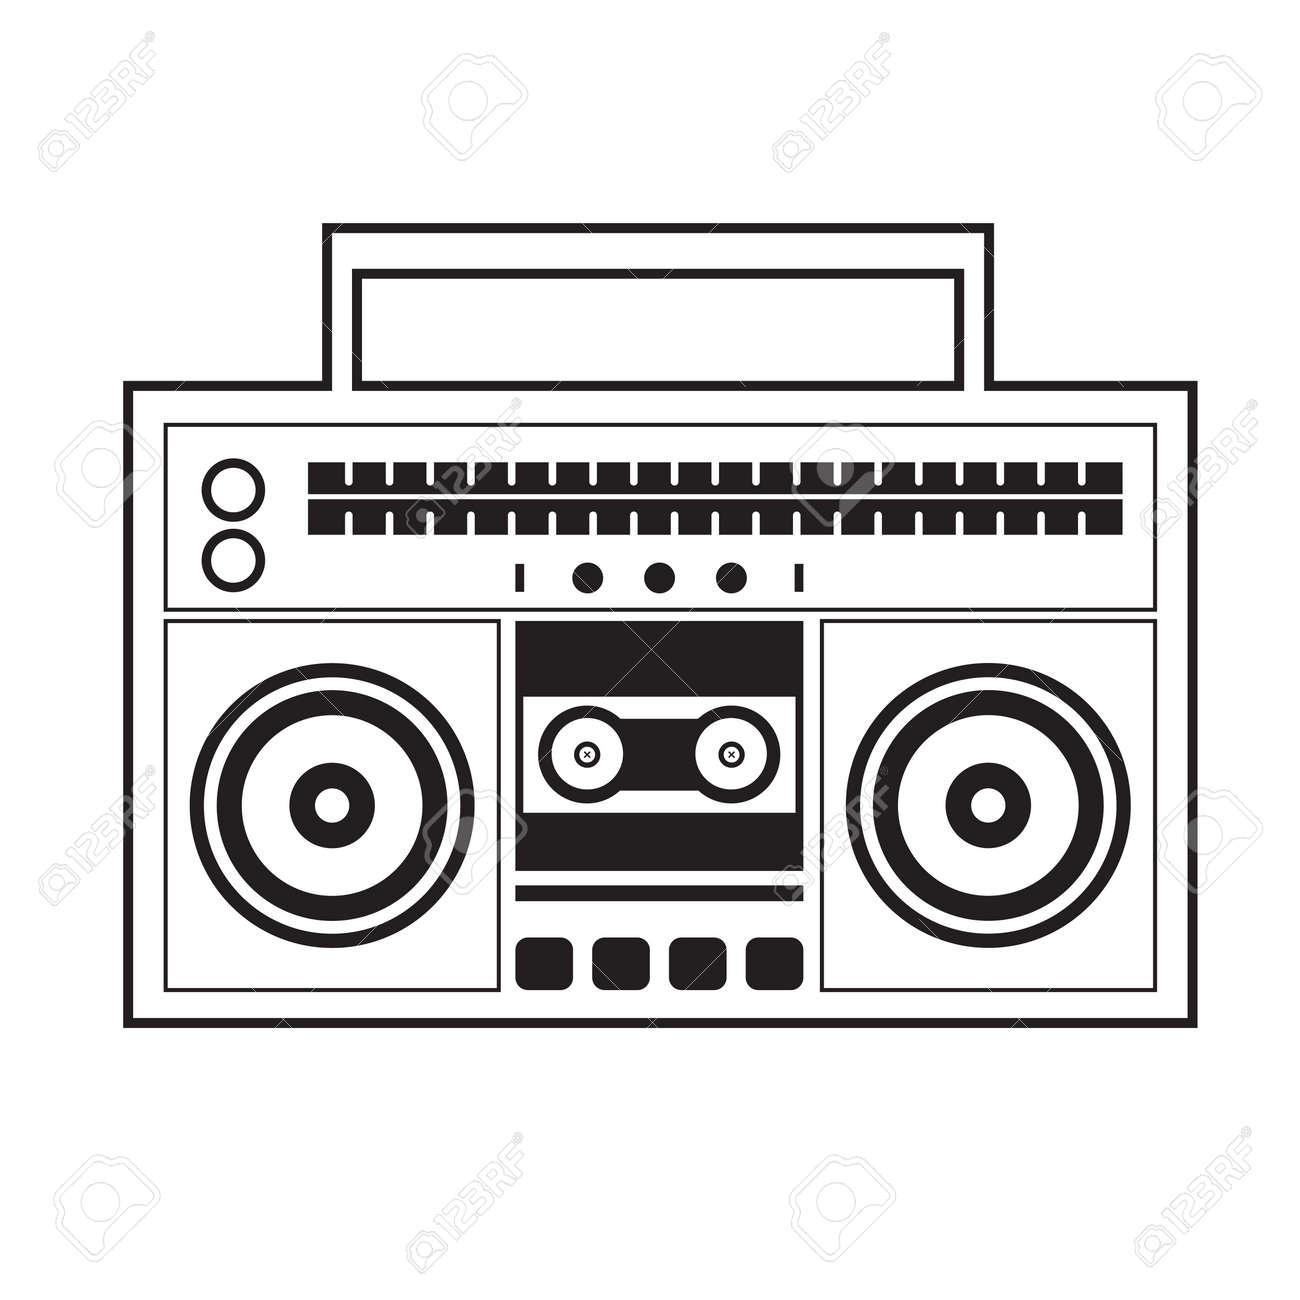 Ghetto blaster radio vector illustration royalty free cliparts ghetto blaster radio vector illustration stock vector 26453256 sciox Gallery